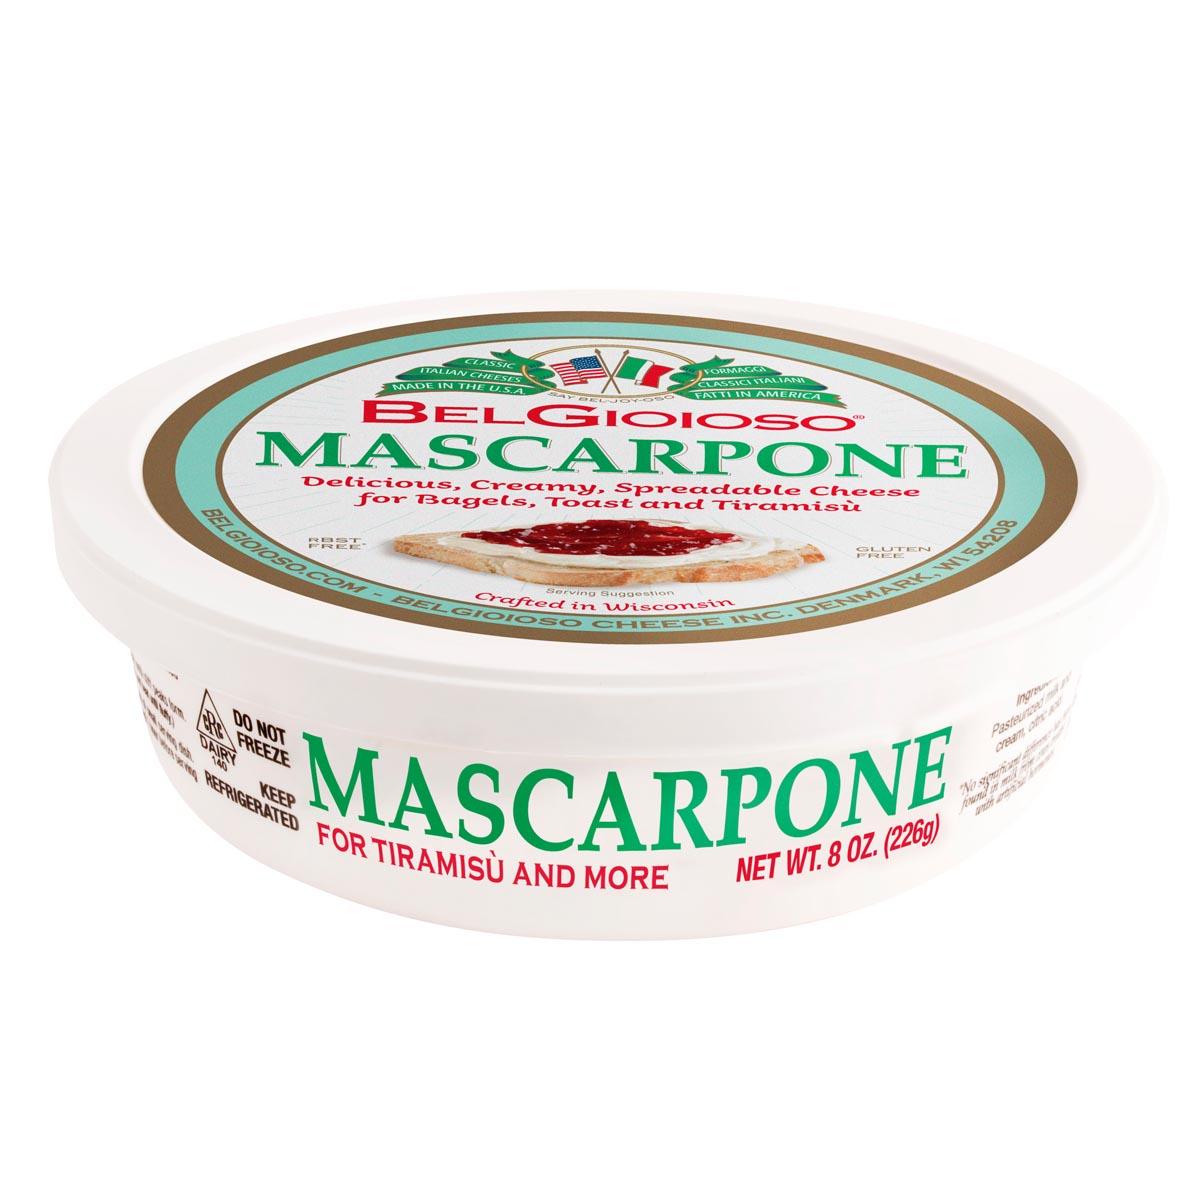 Mascarpone Container